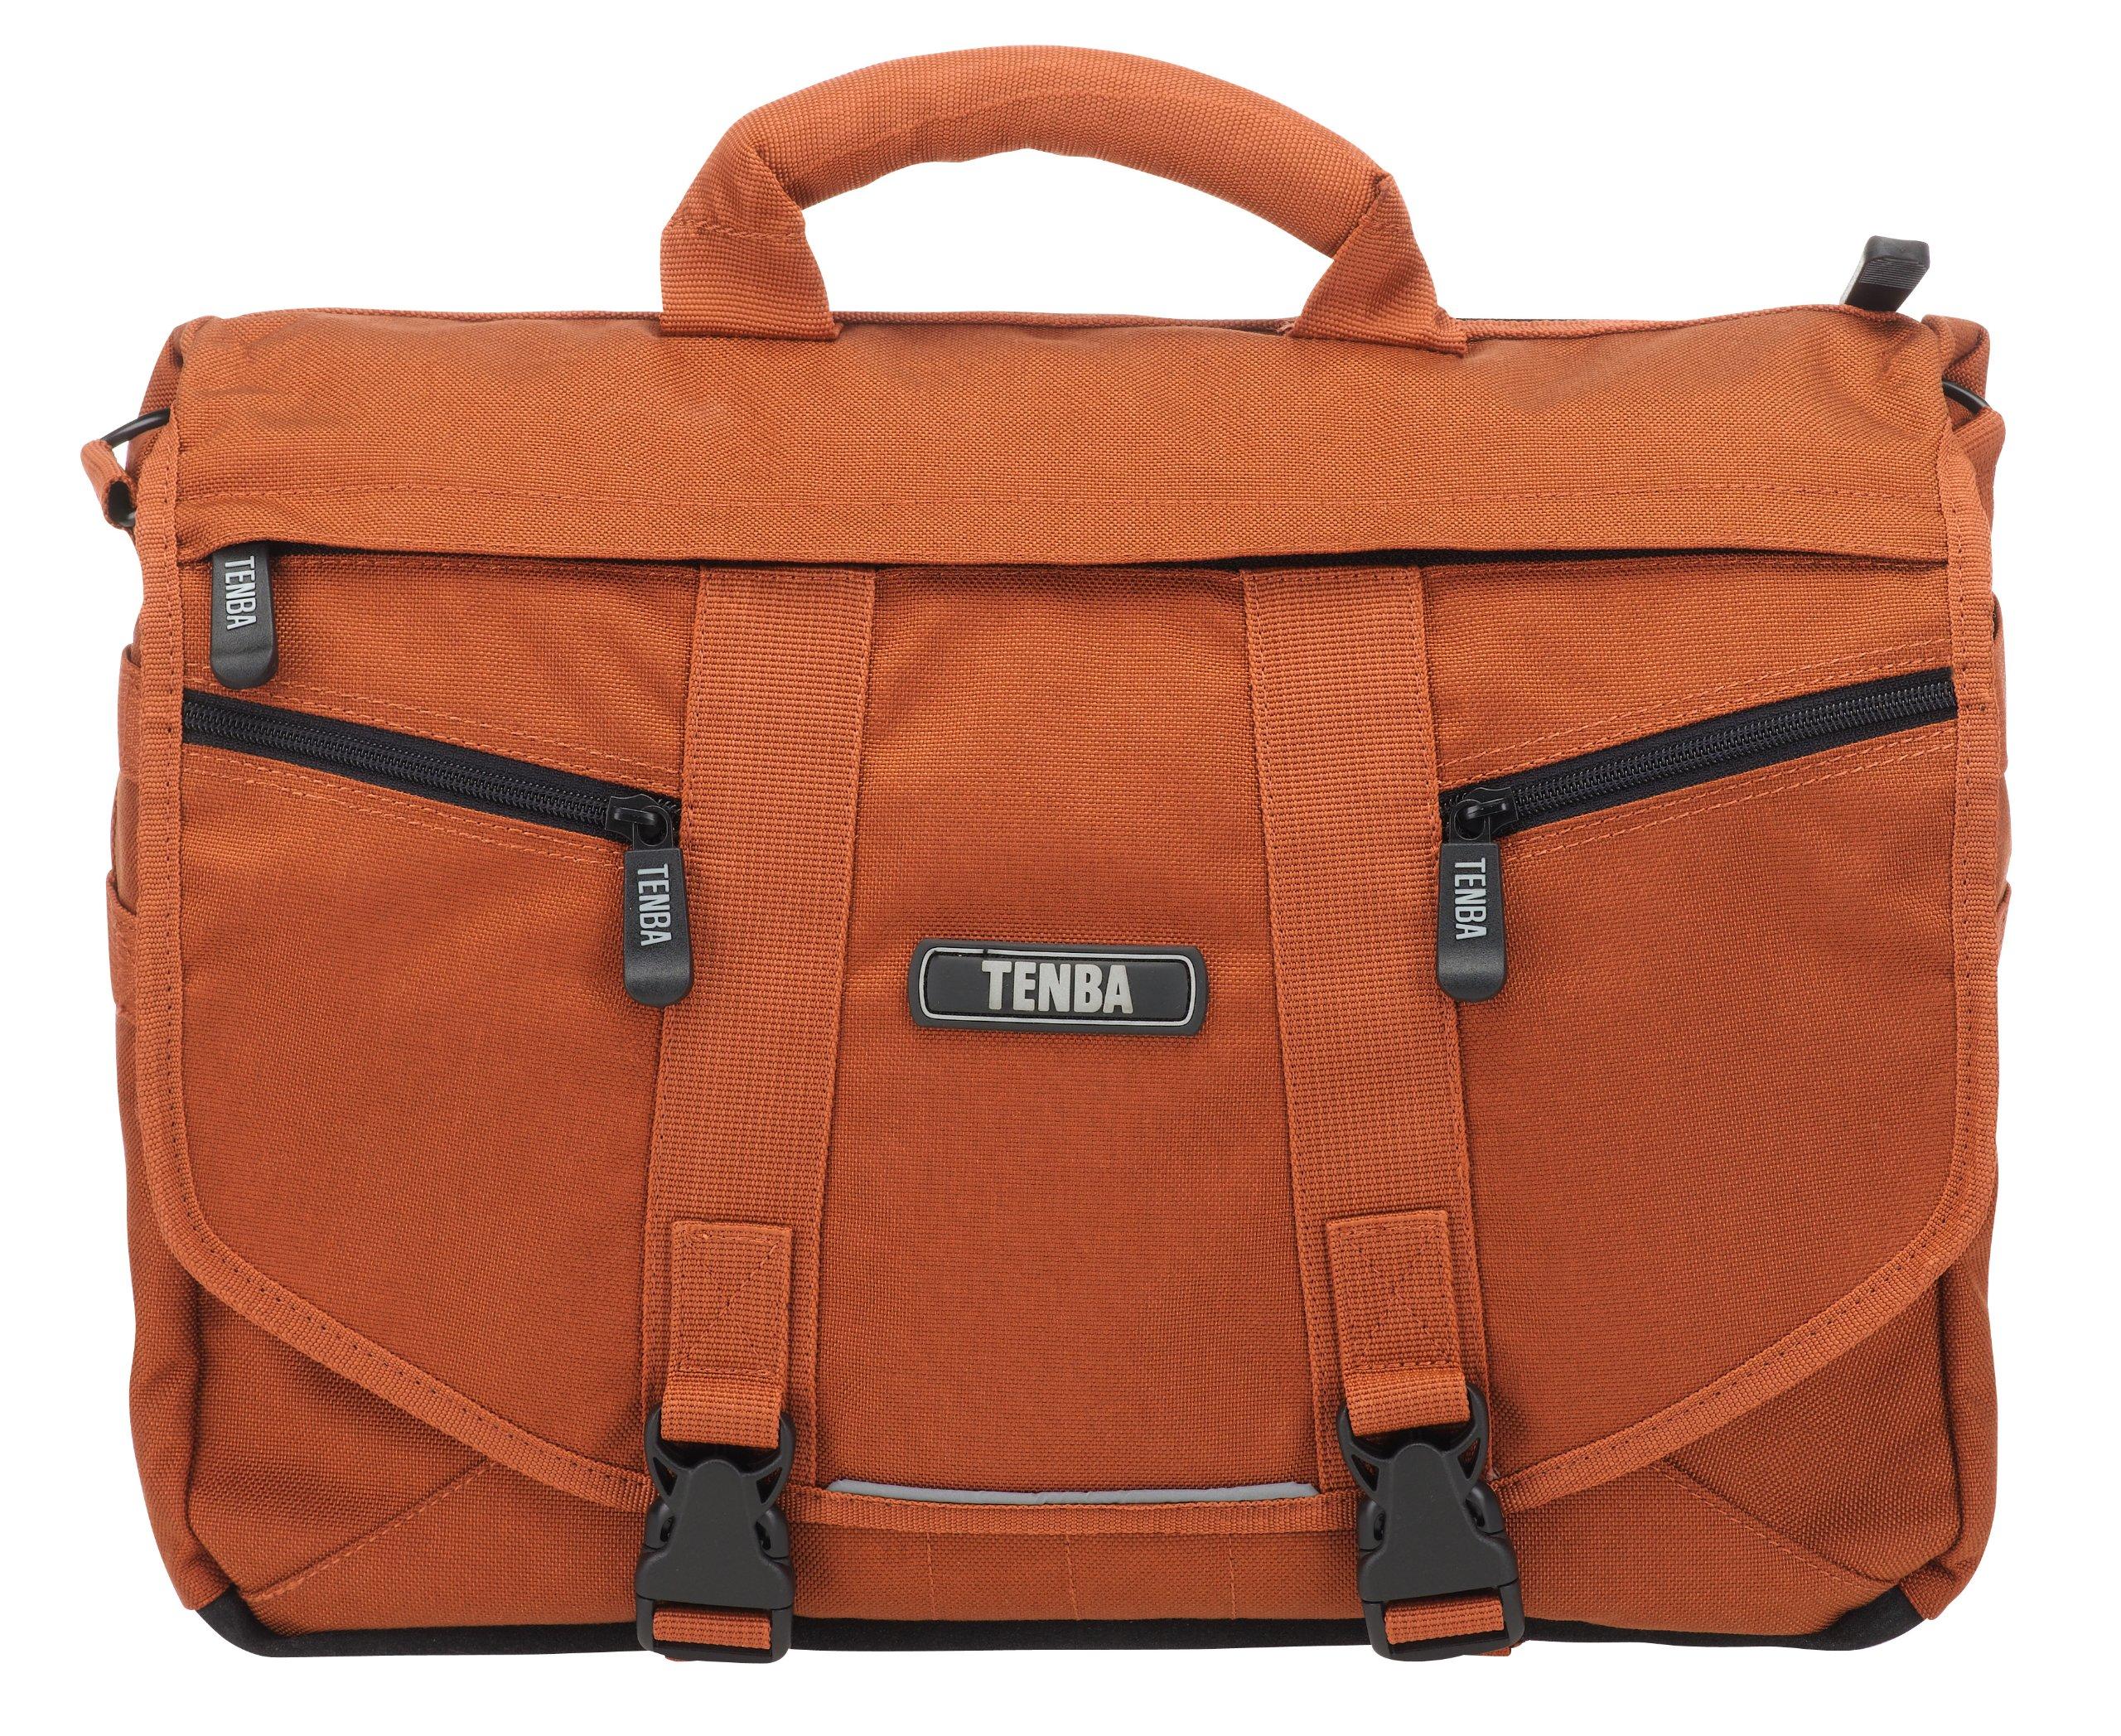 Tenba Messenger Mini Photo/Laptop Bag - Orange (638-364)